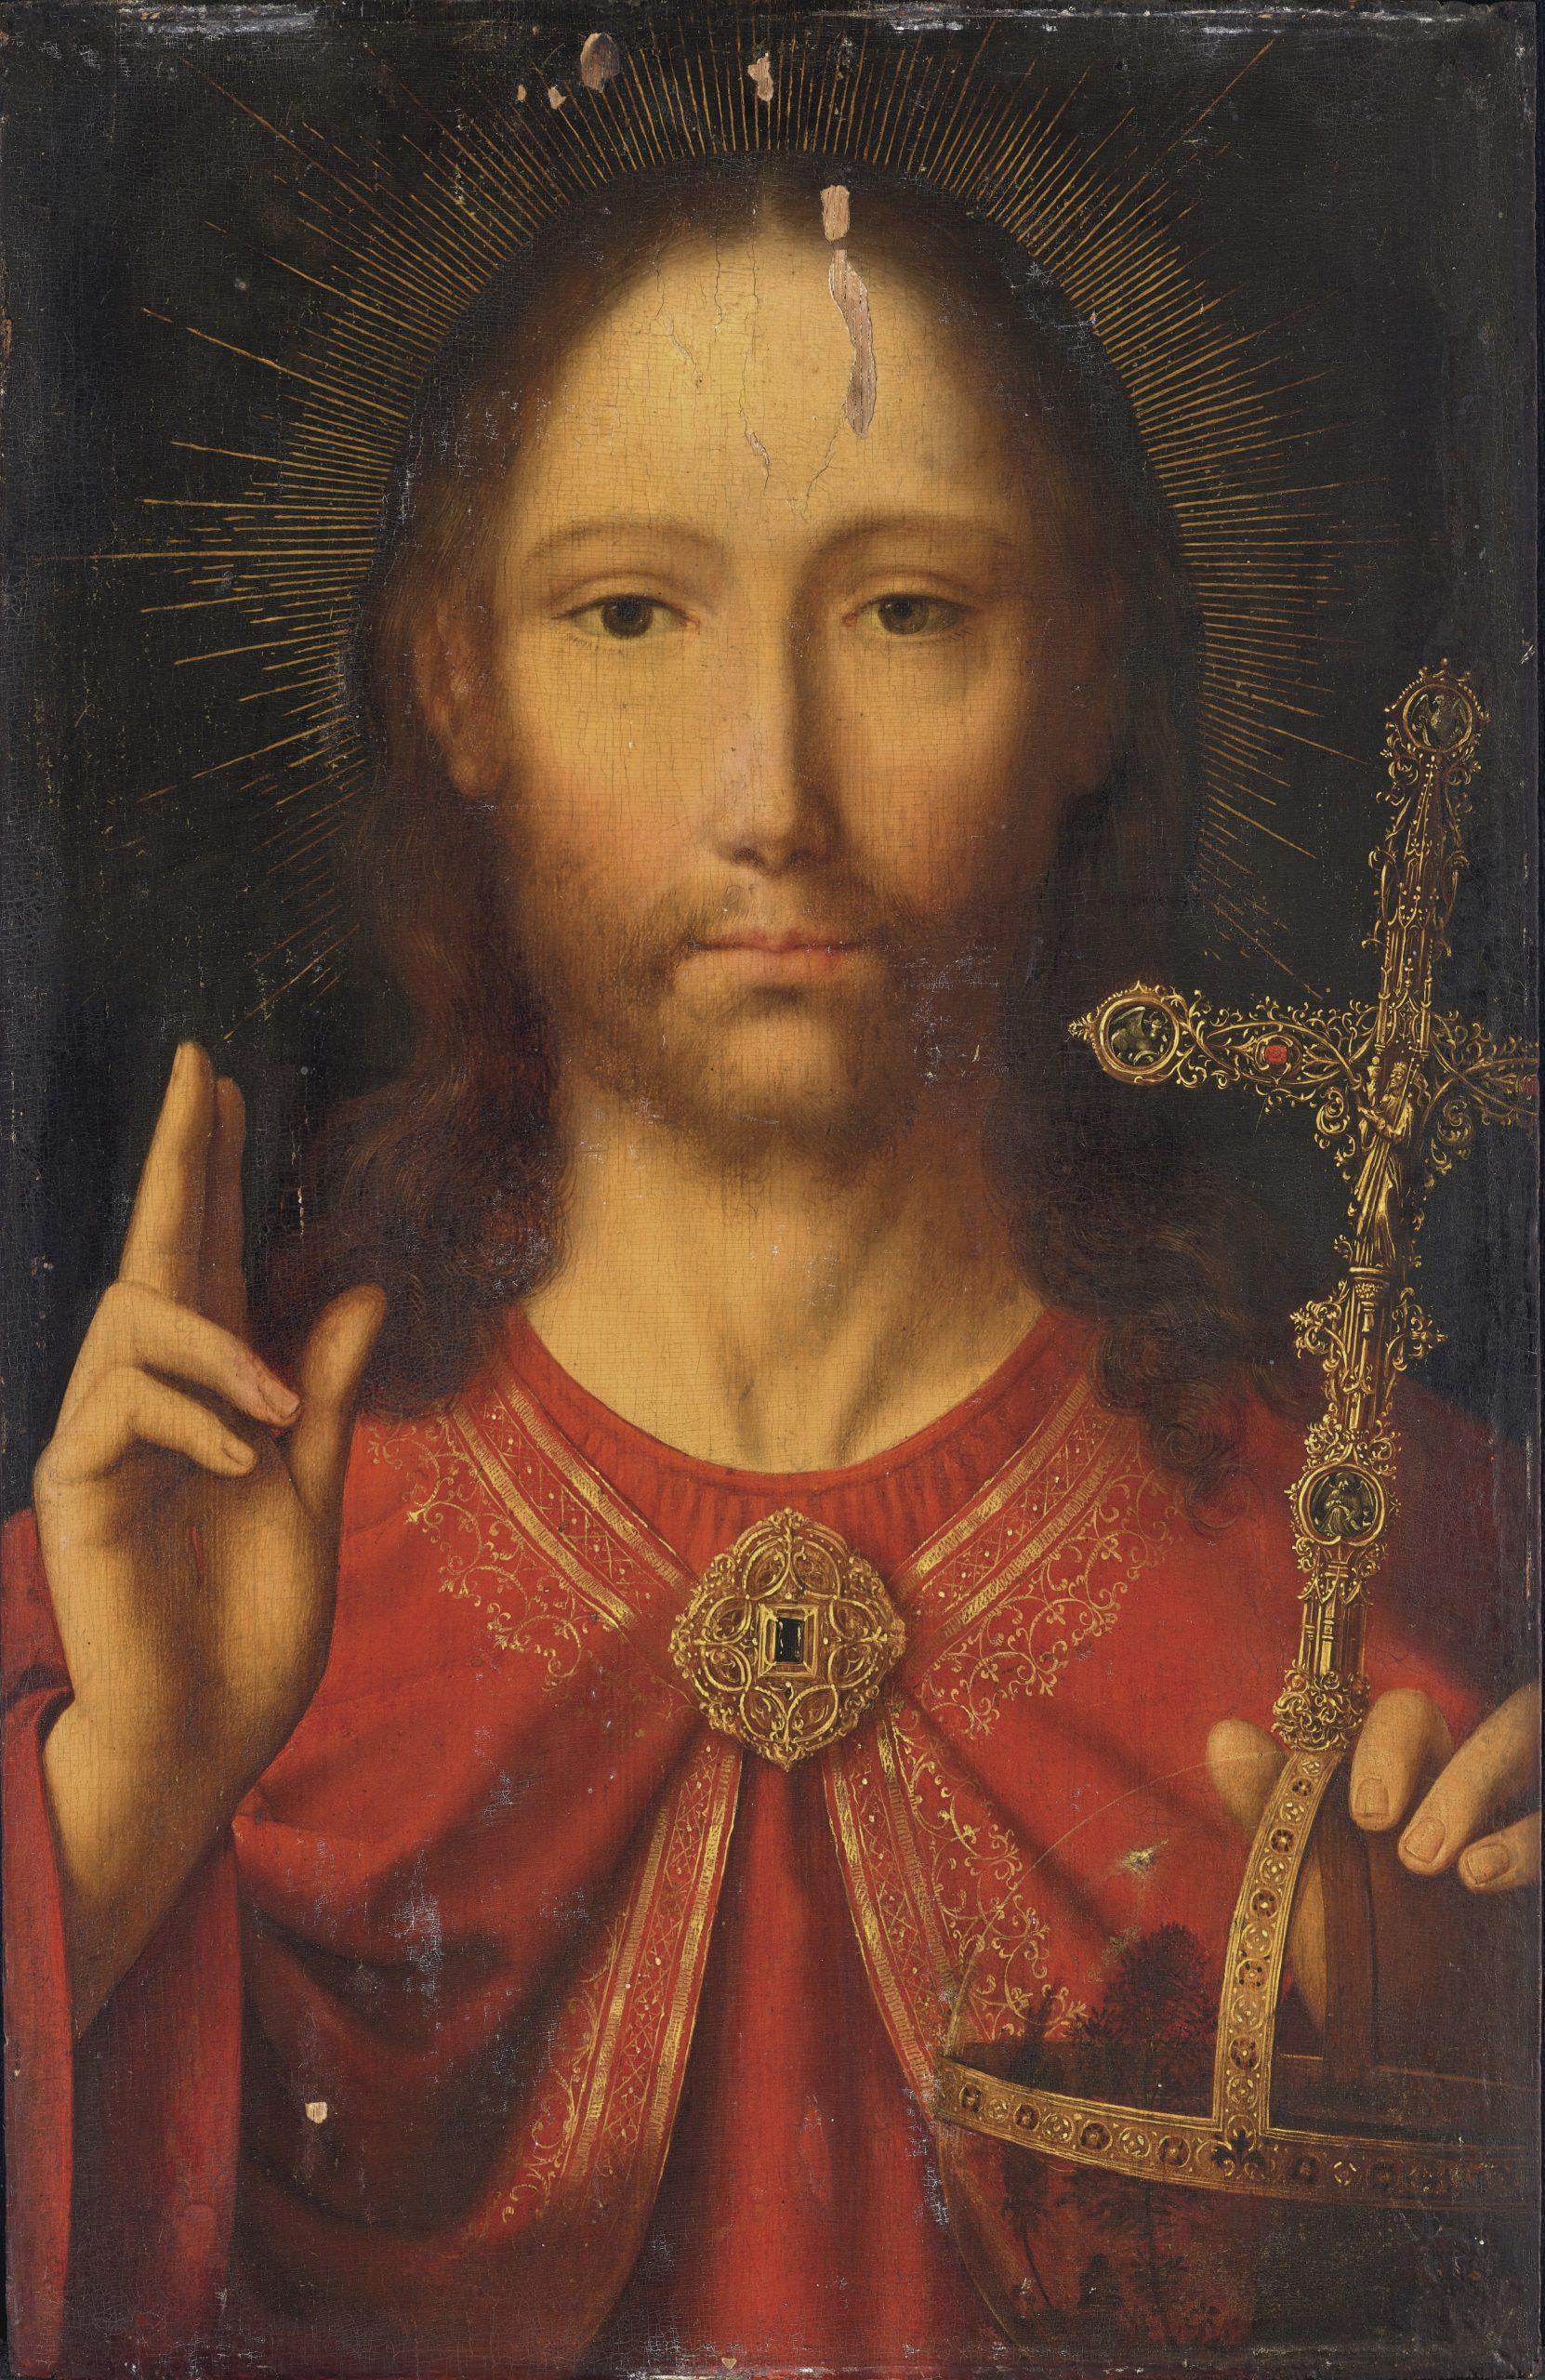 Christ Salvator Mundi